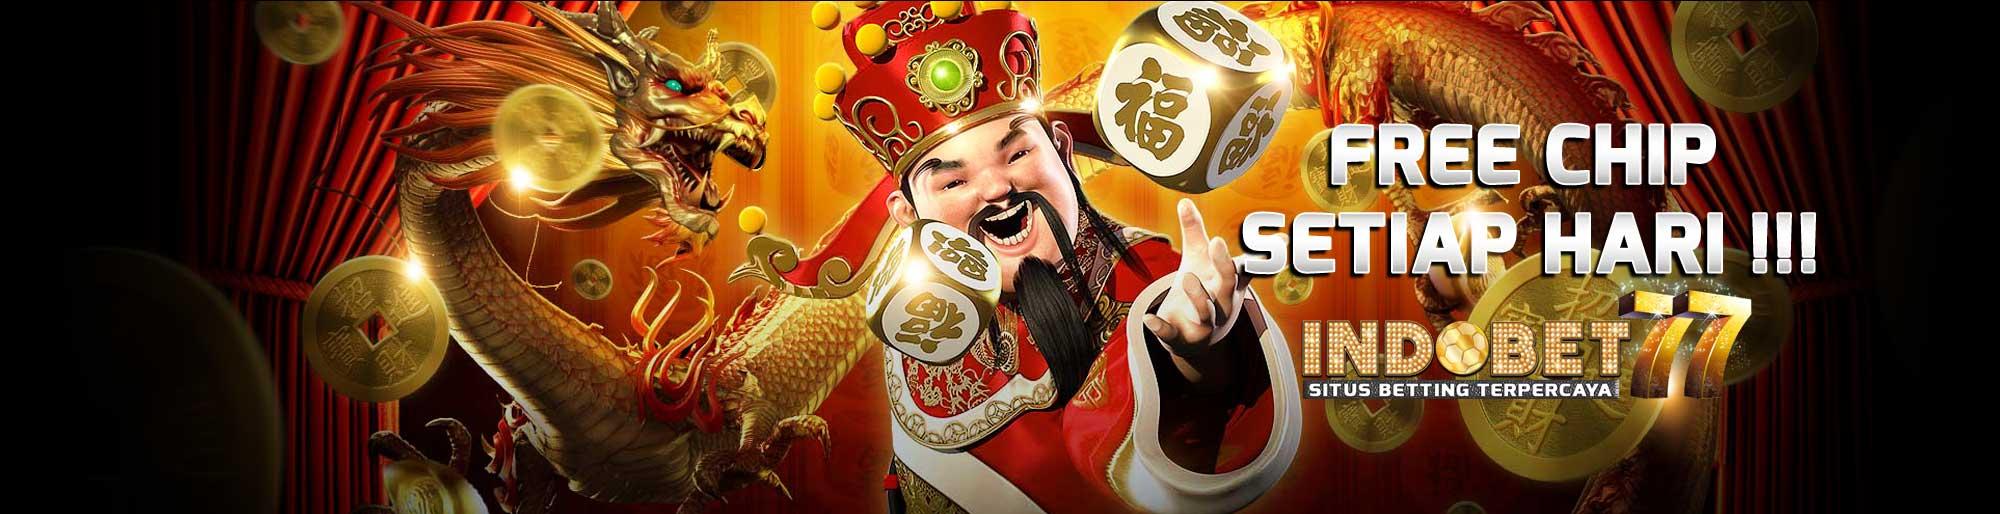 freebet dan freechip bandar agen judi bola, live casino, game slot, sabung ayam online